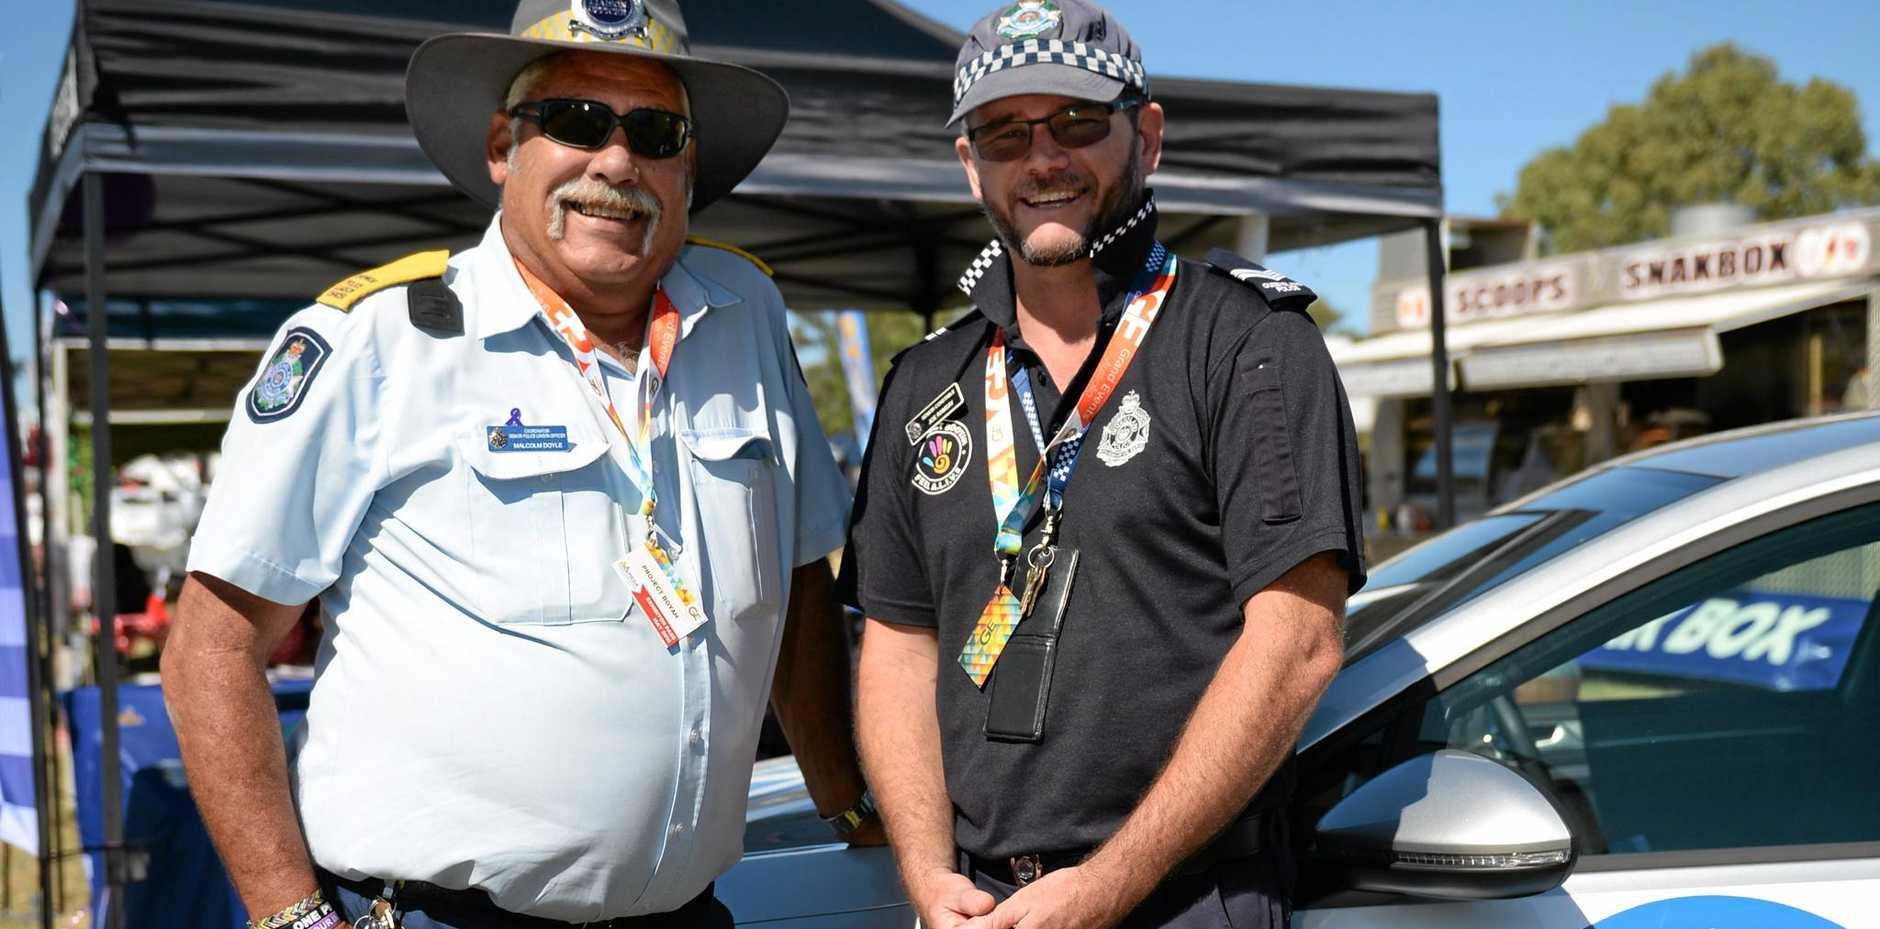 PROGRAM: Senior Constable Joe Ramsy, Rockhampton co-ordinator for Project Booyah.